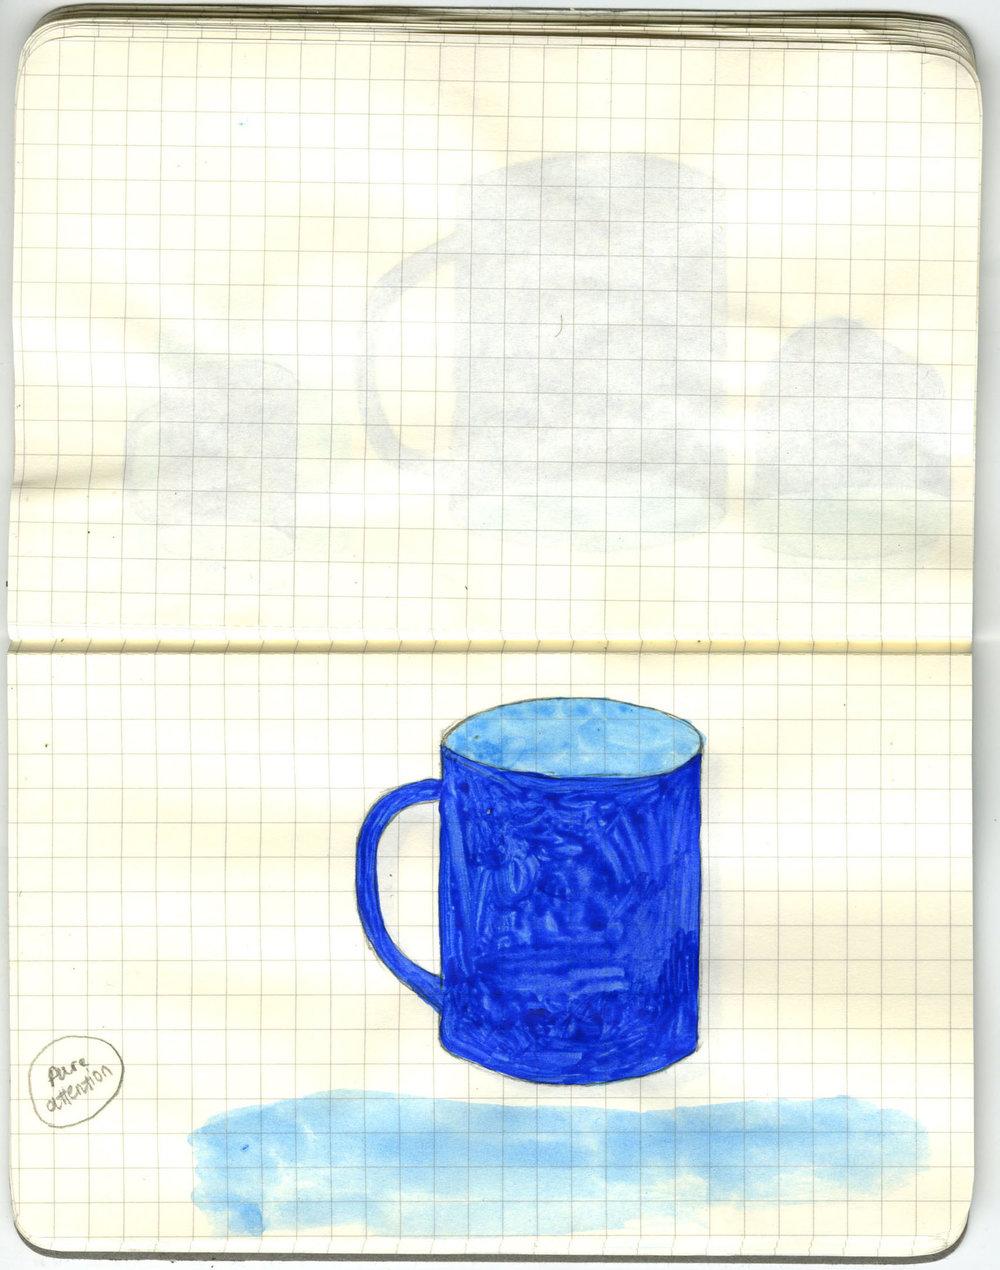 cup020.jpg